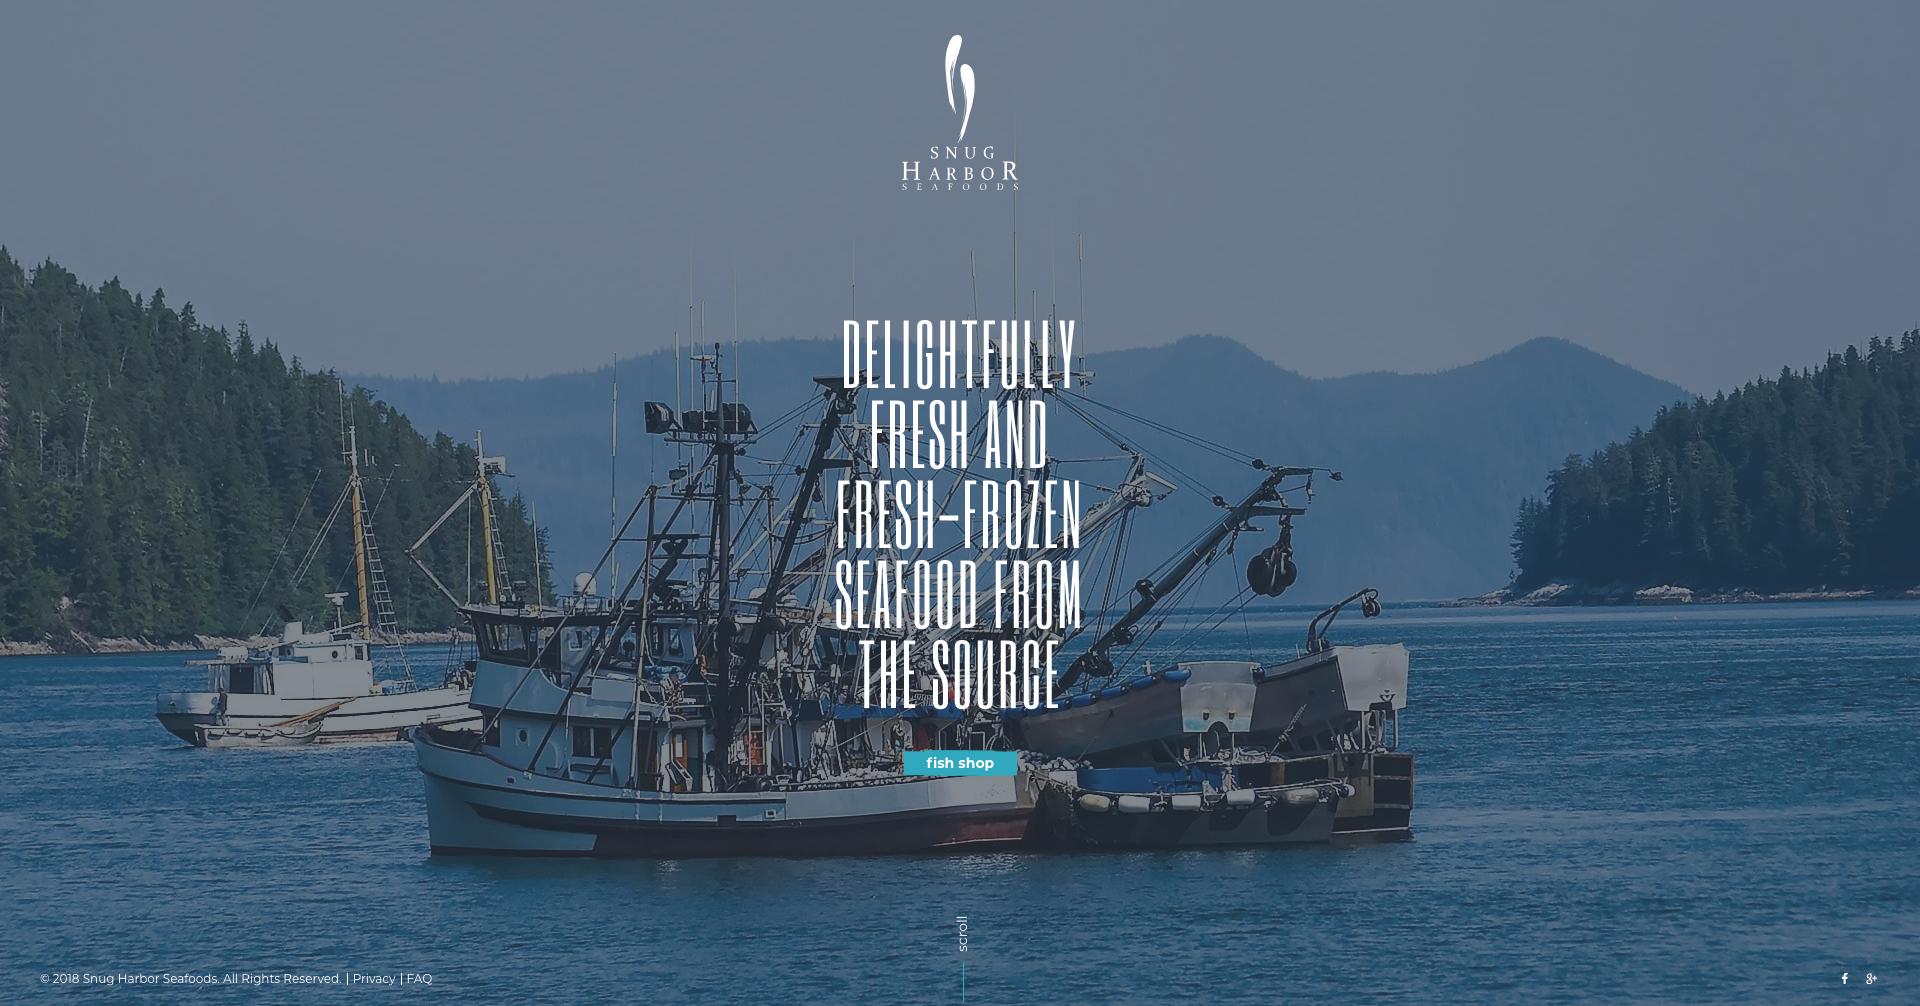 Snug Harbor Website Design Preview